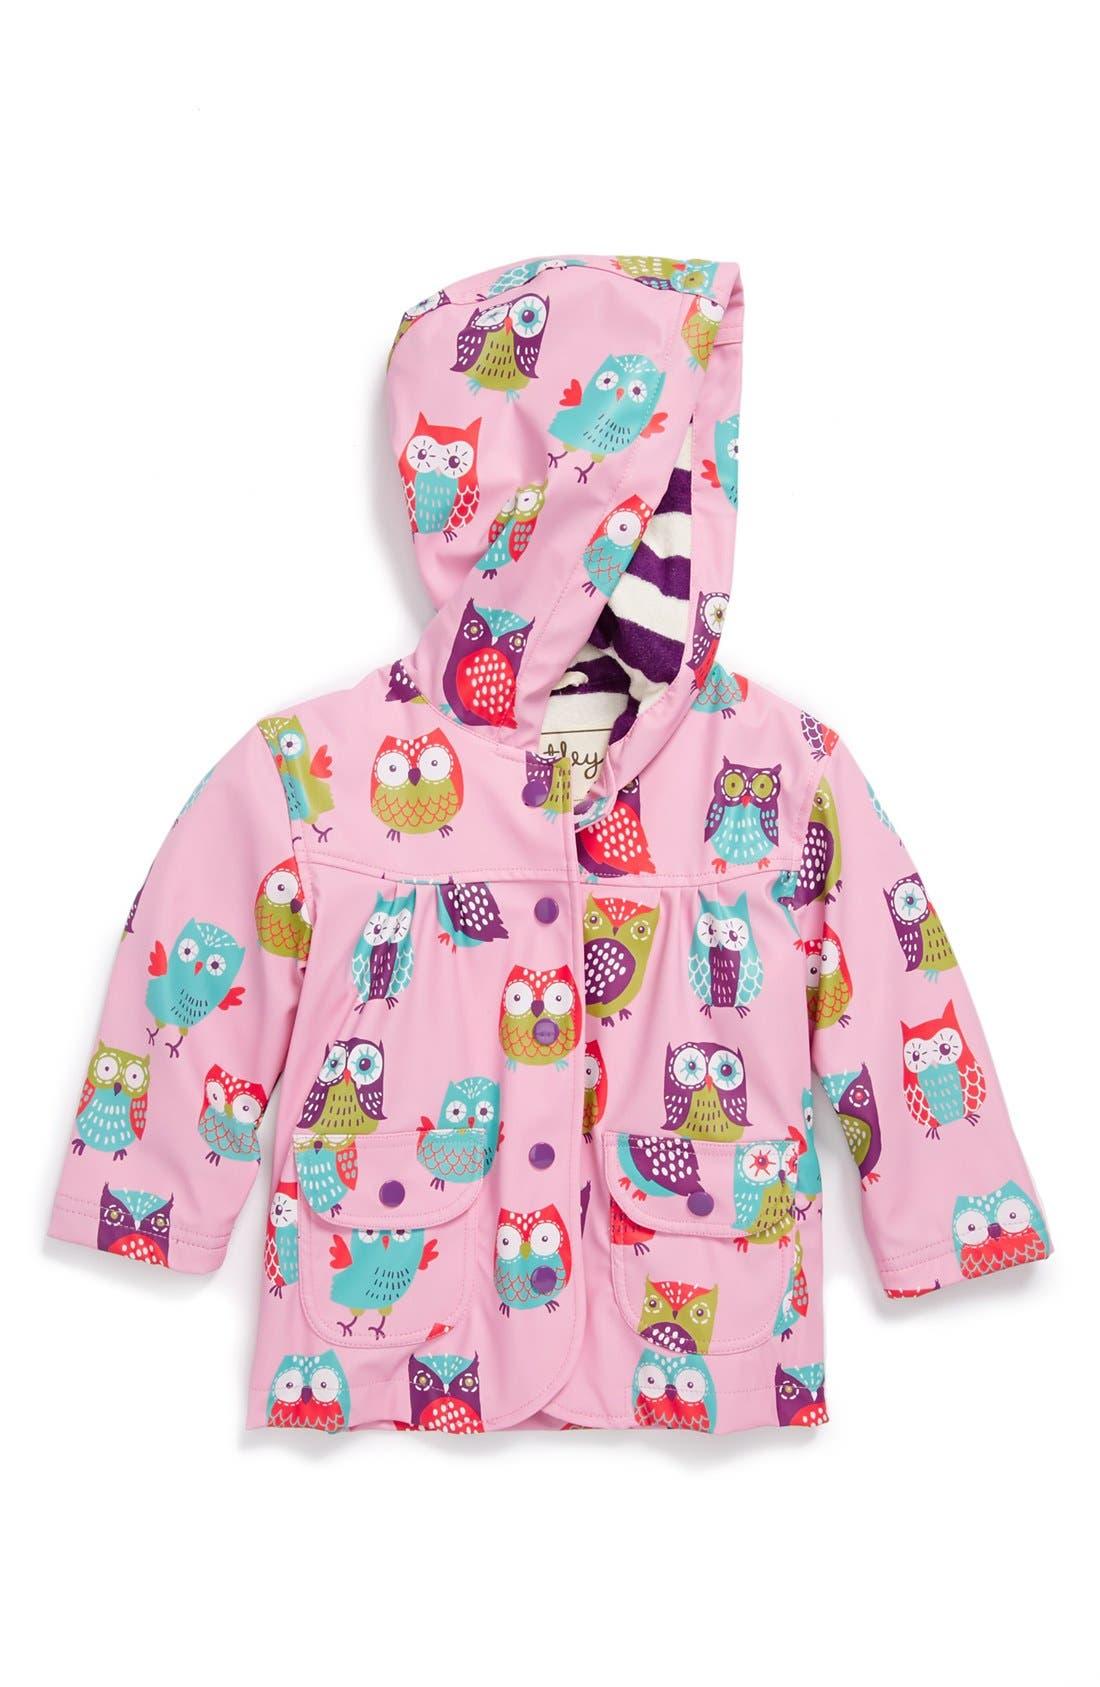 Main Image - Hatley 'Party Owls' Rain Jacket (Toddler Girls, Little Girls & Big Girls)